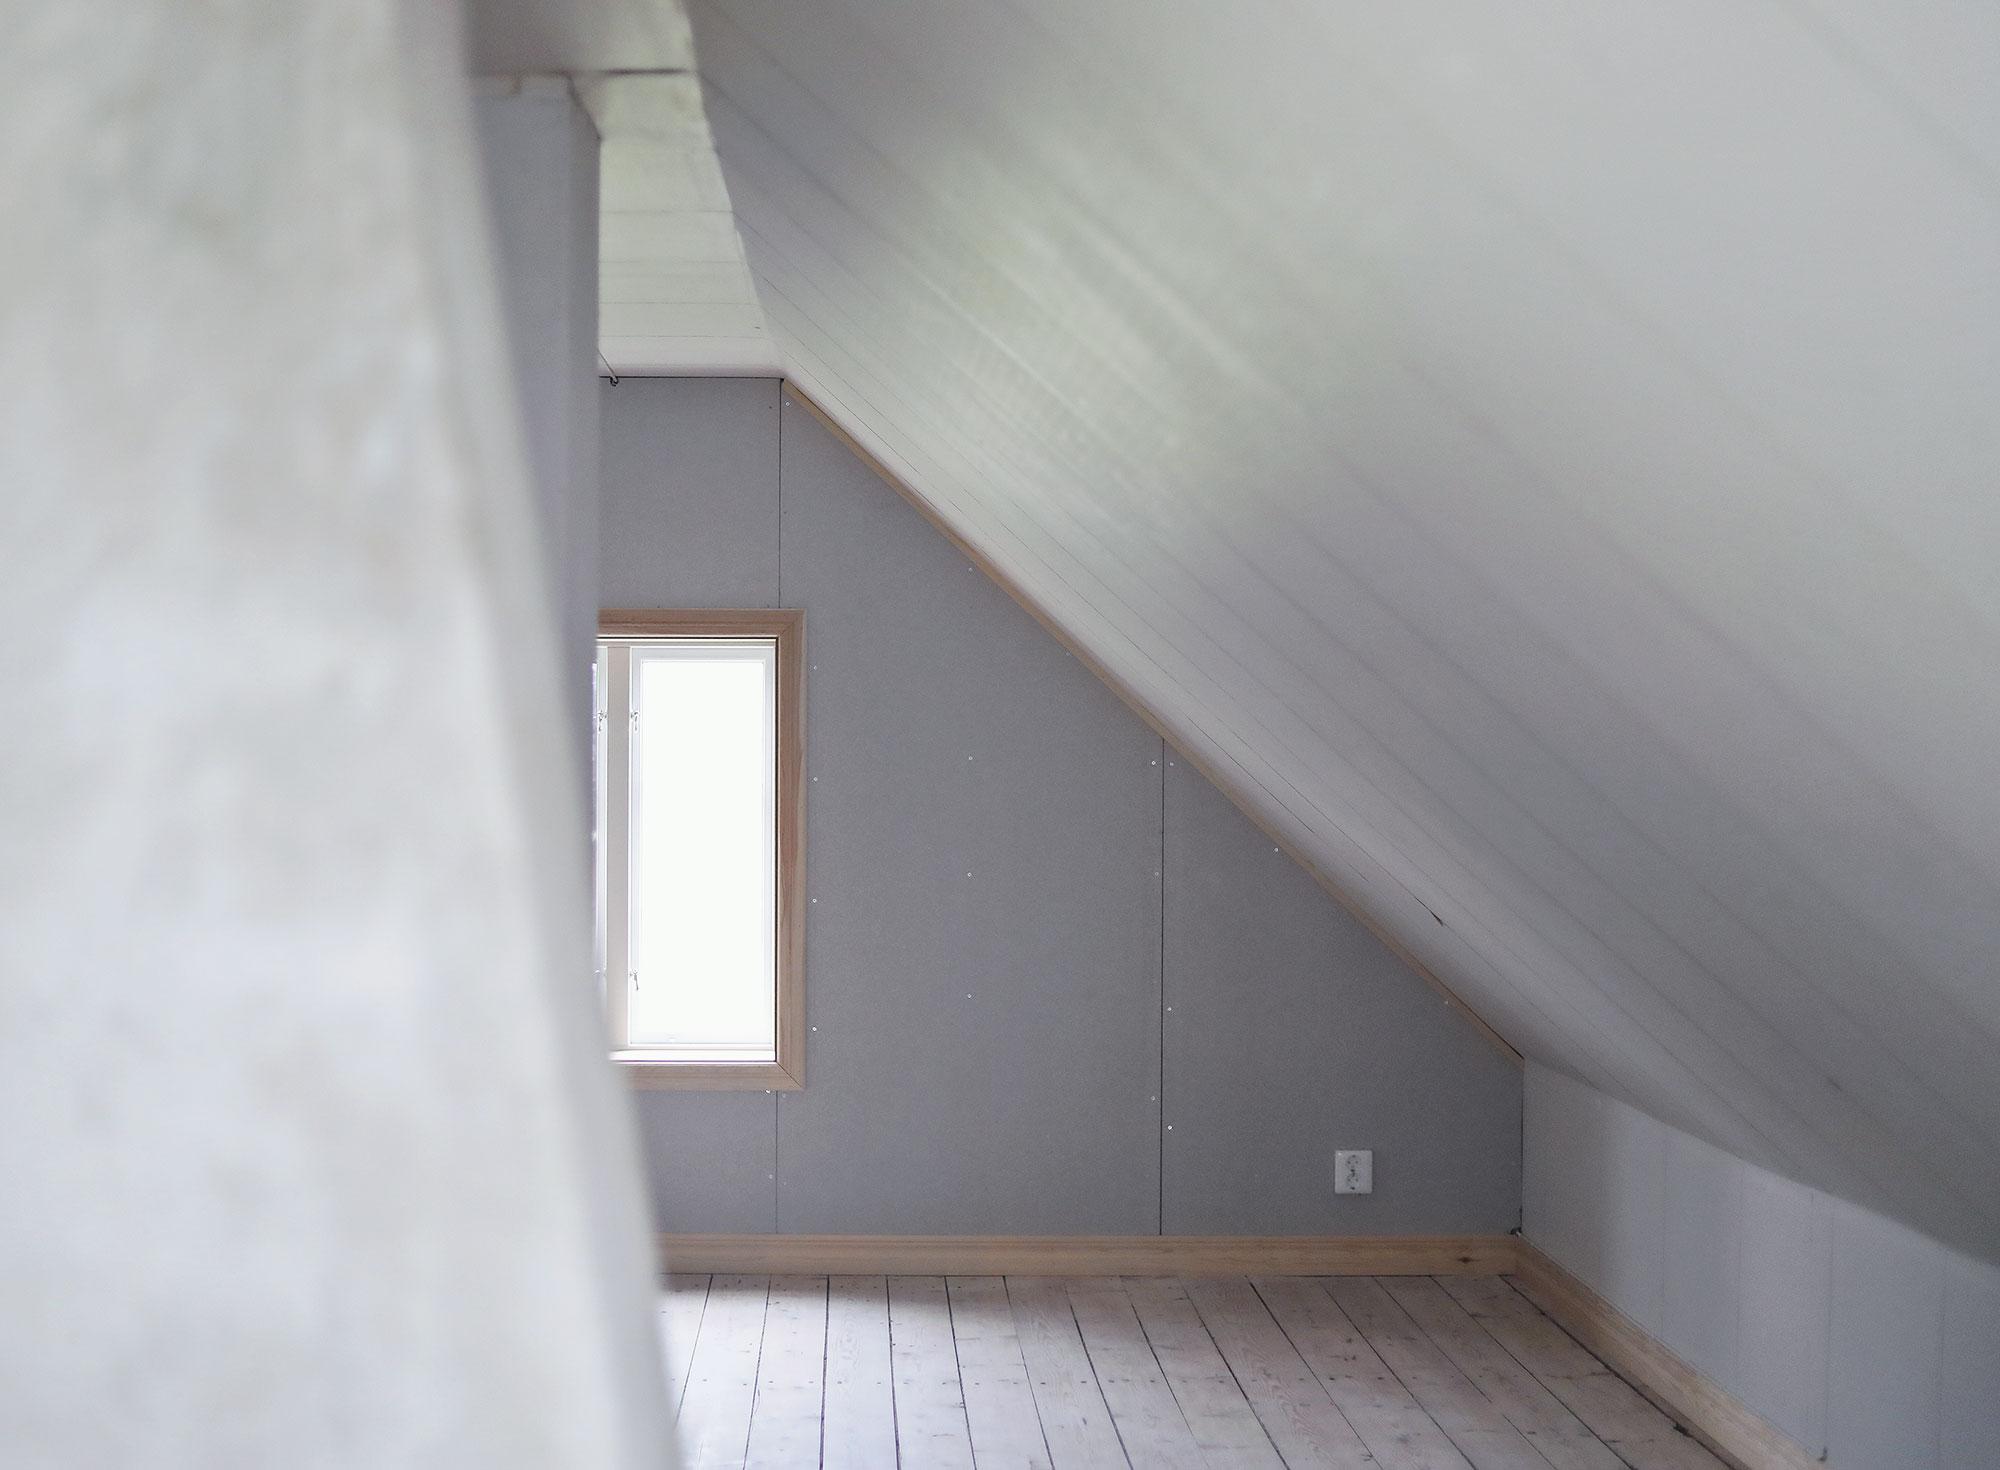 torp gotland råvind övervåning sovrum